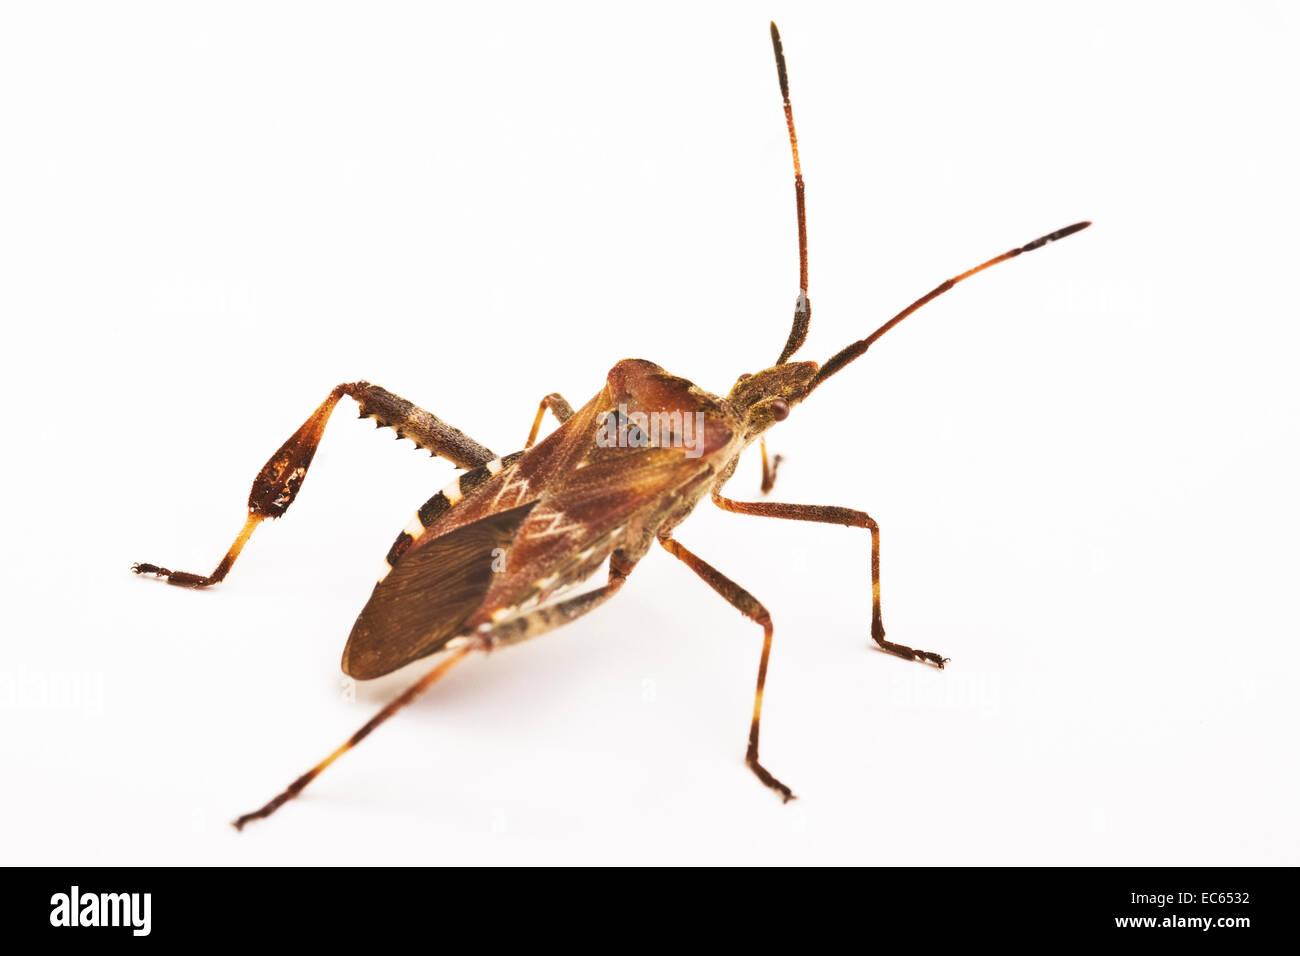 Western Conifer Seed Bug Leptoglossus occidentalis - Stock Image